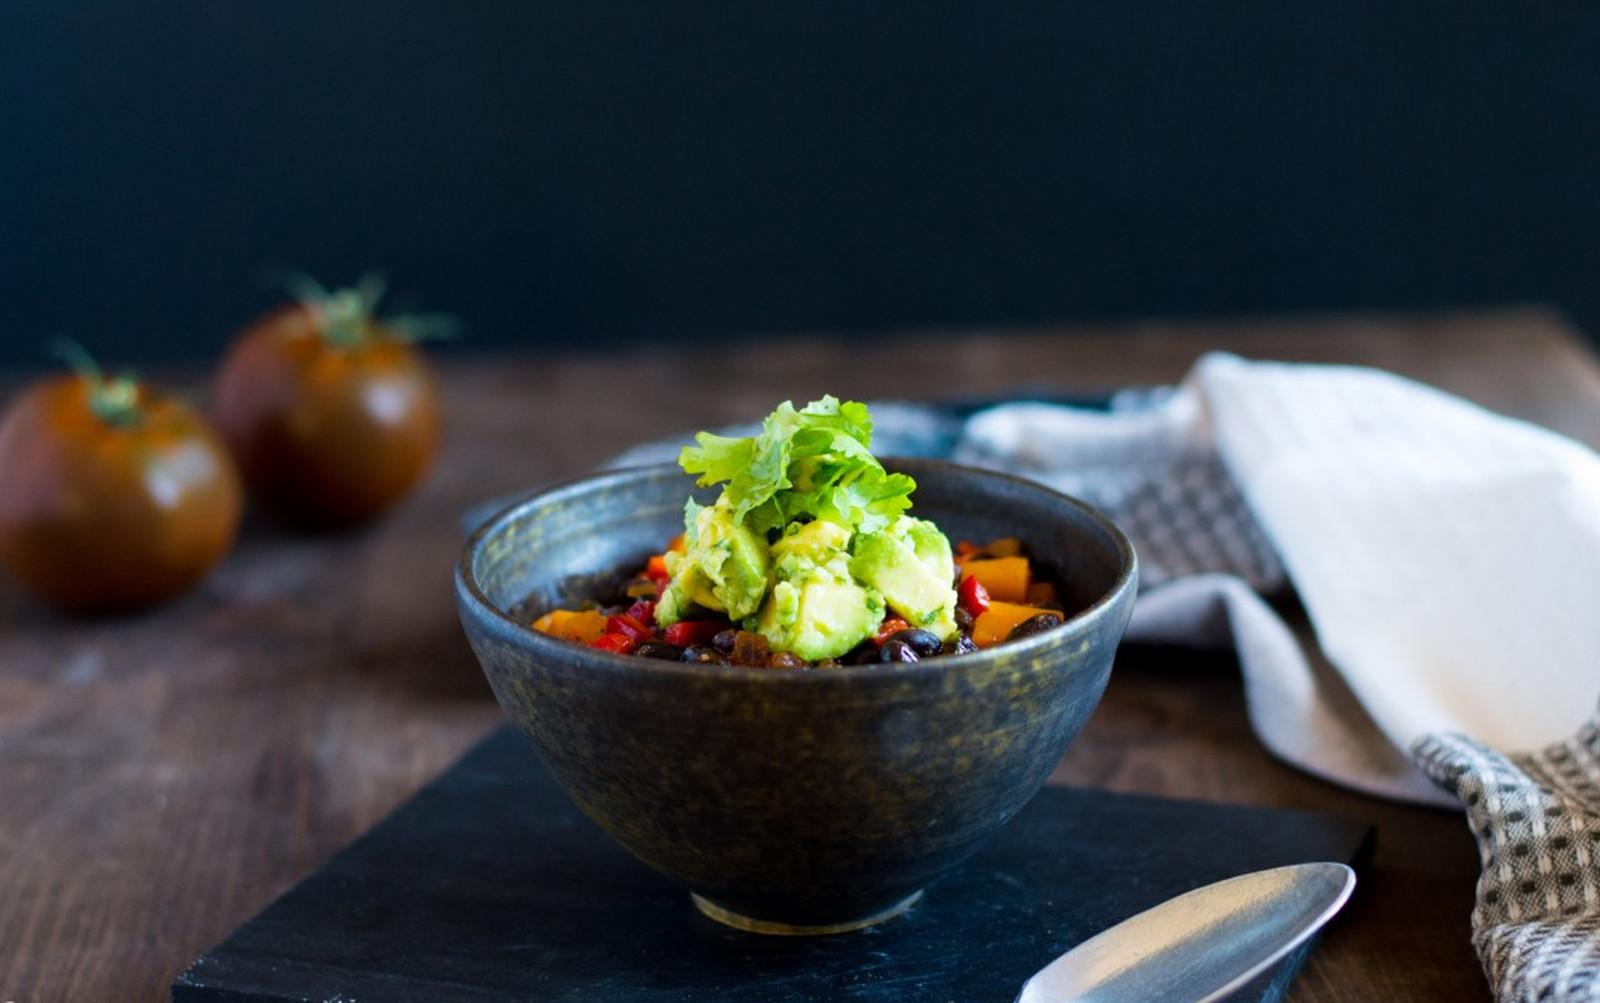 Black Bean and Butternut Squash Chili [Vegan, Gluten-Free]